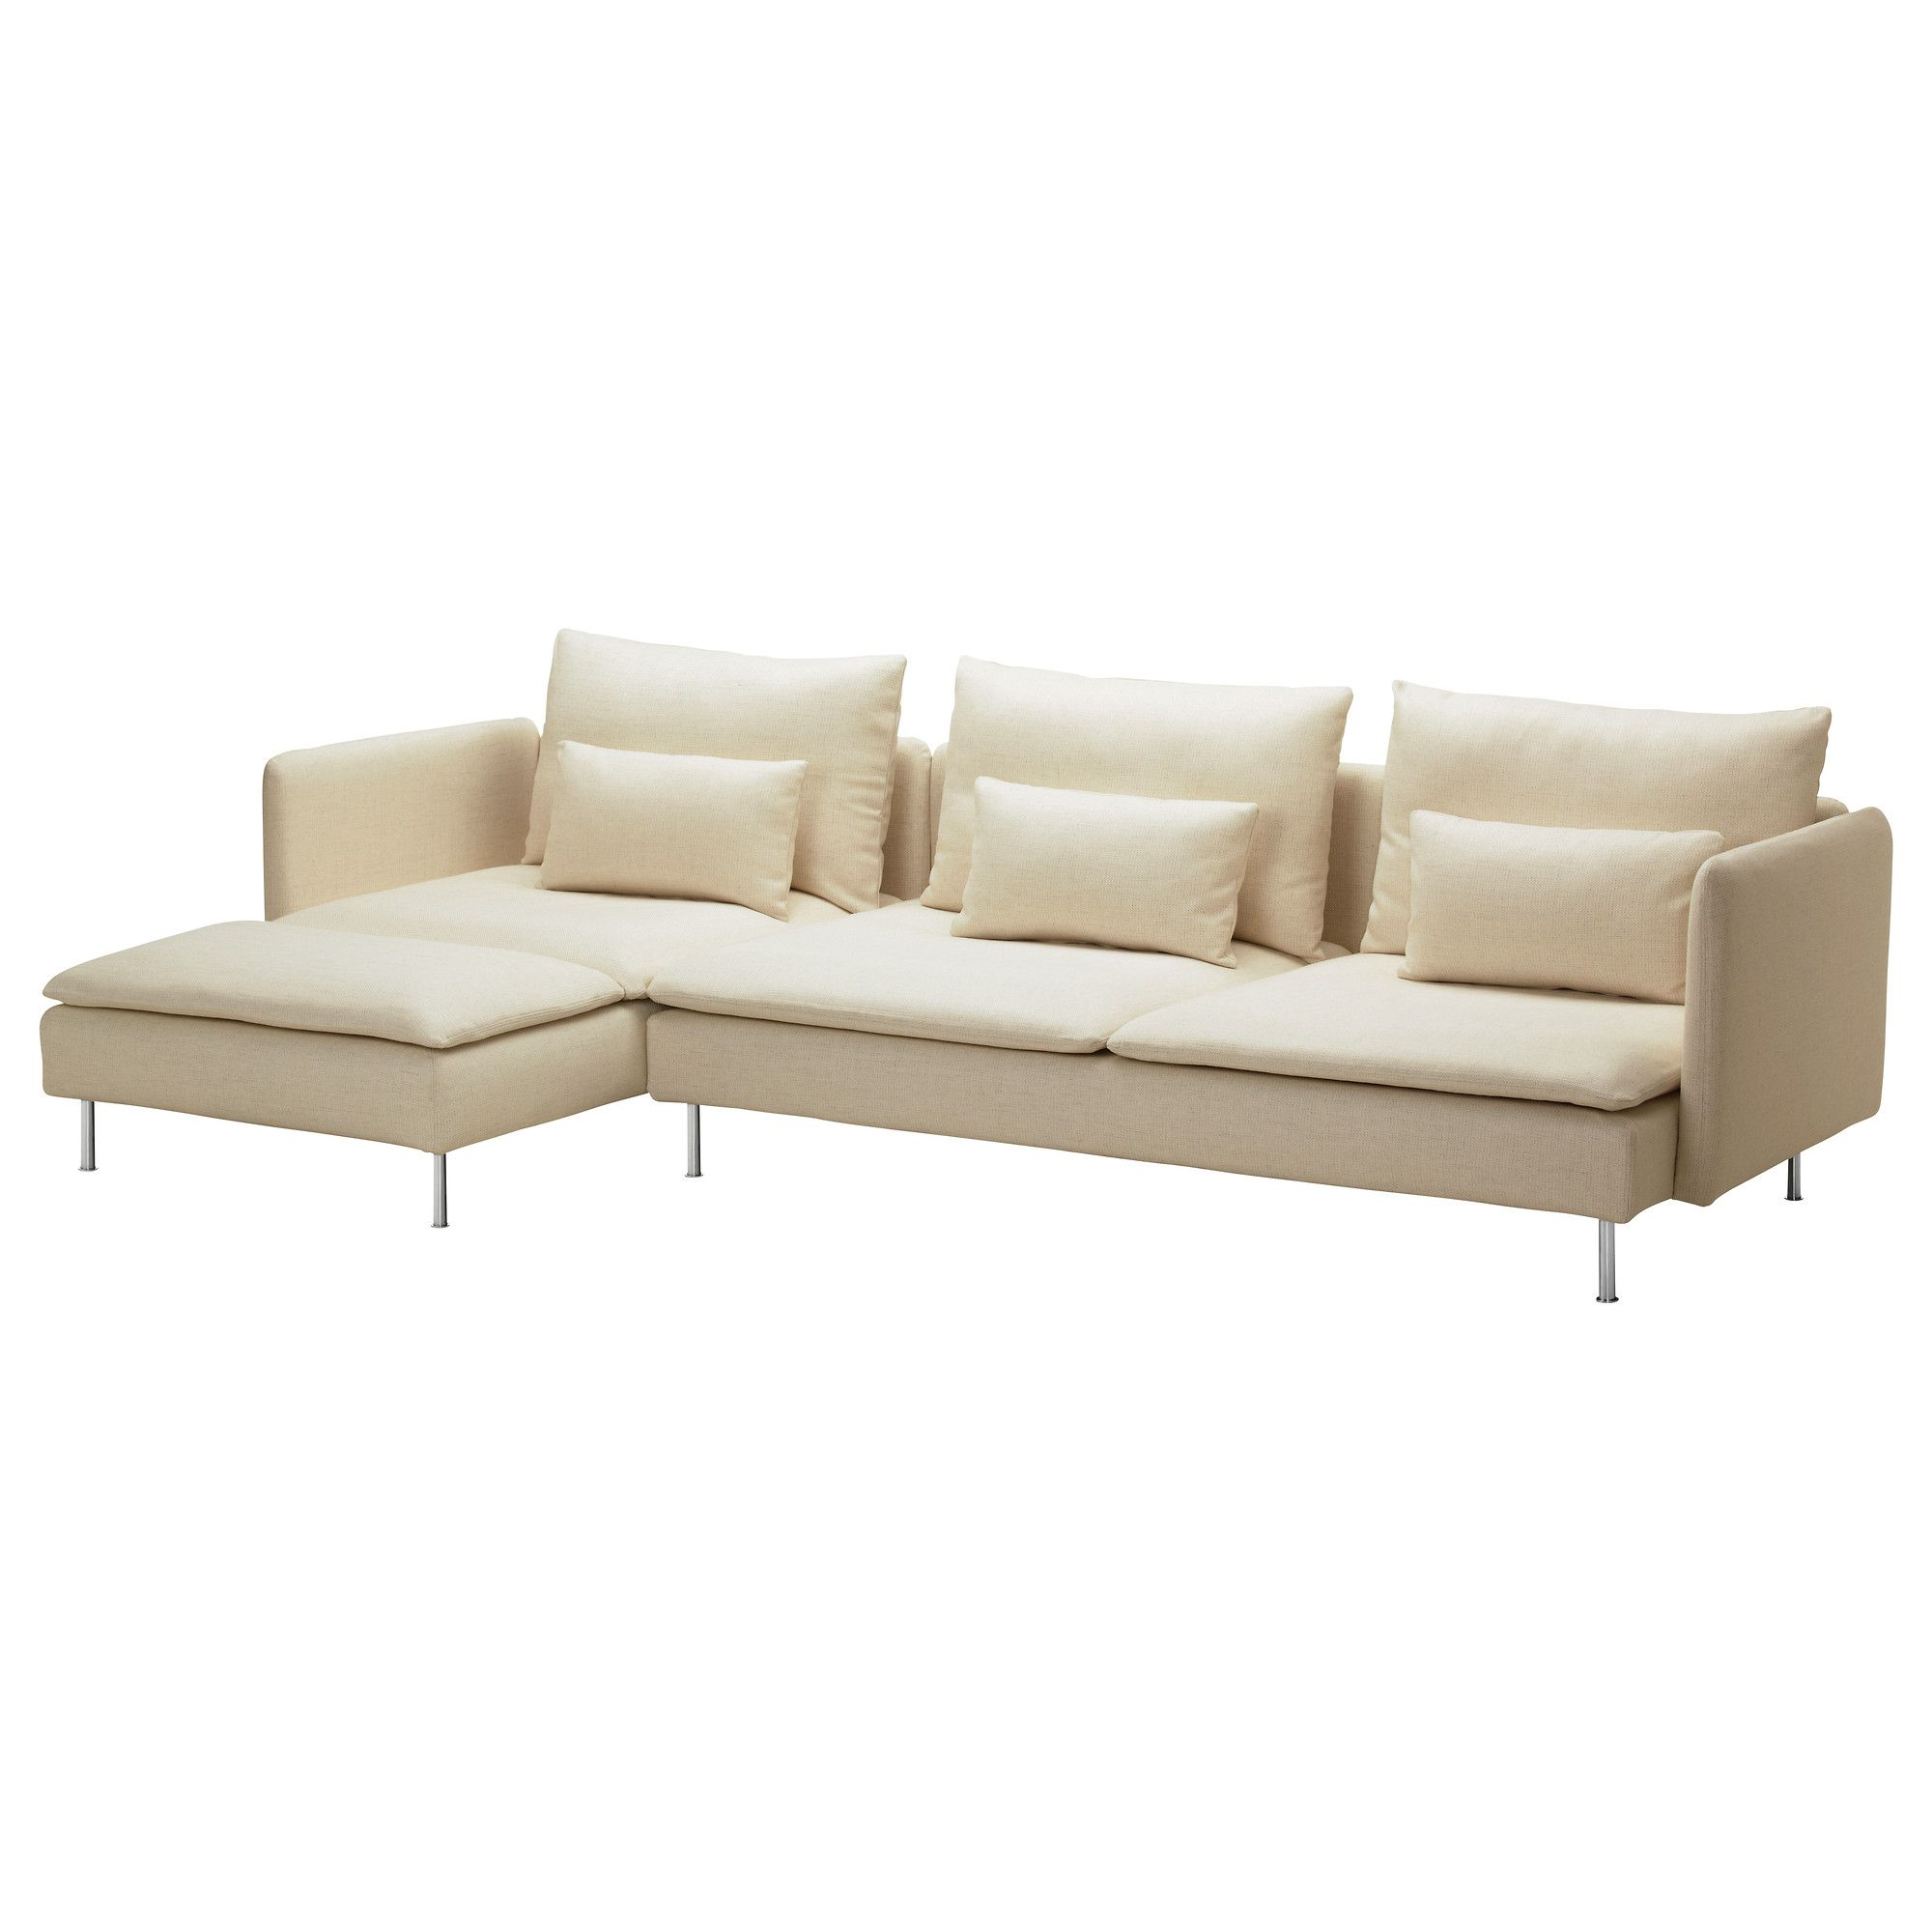 SÖDERHAMN 3er-Sofa und Récamiere - Isefall natur - IKEA